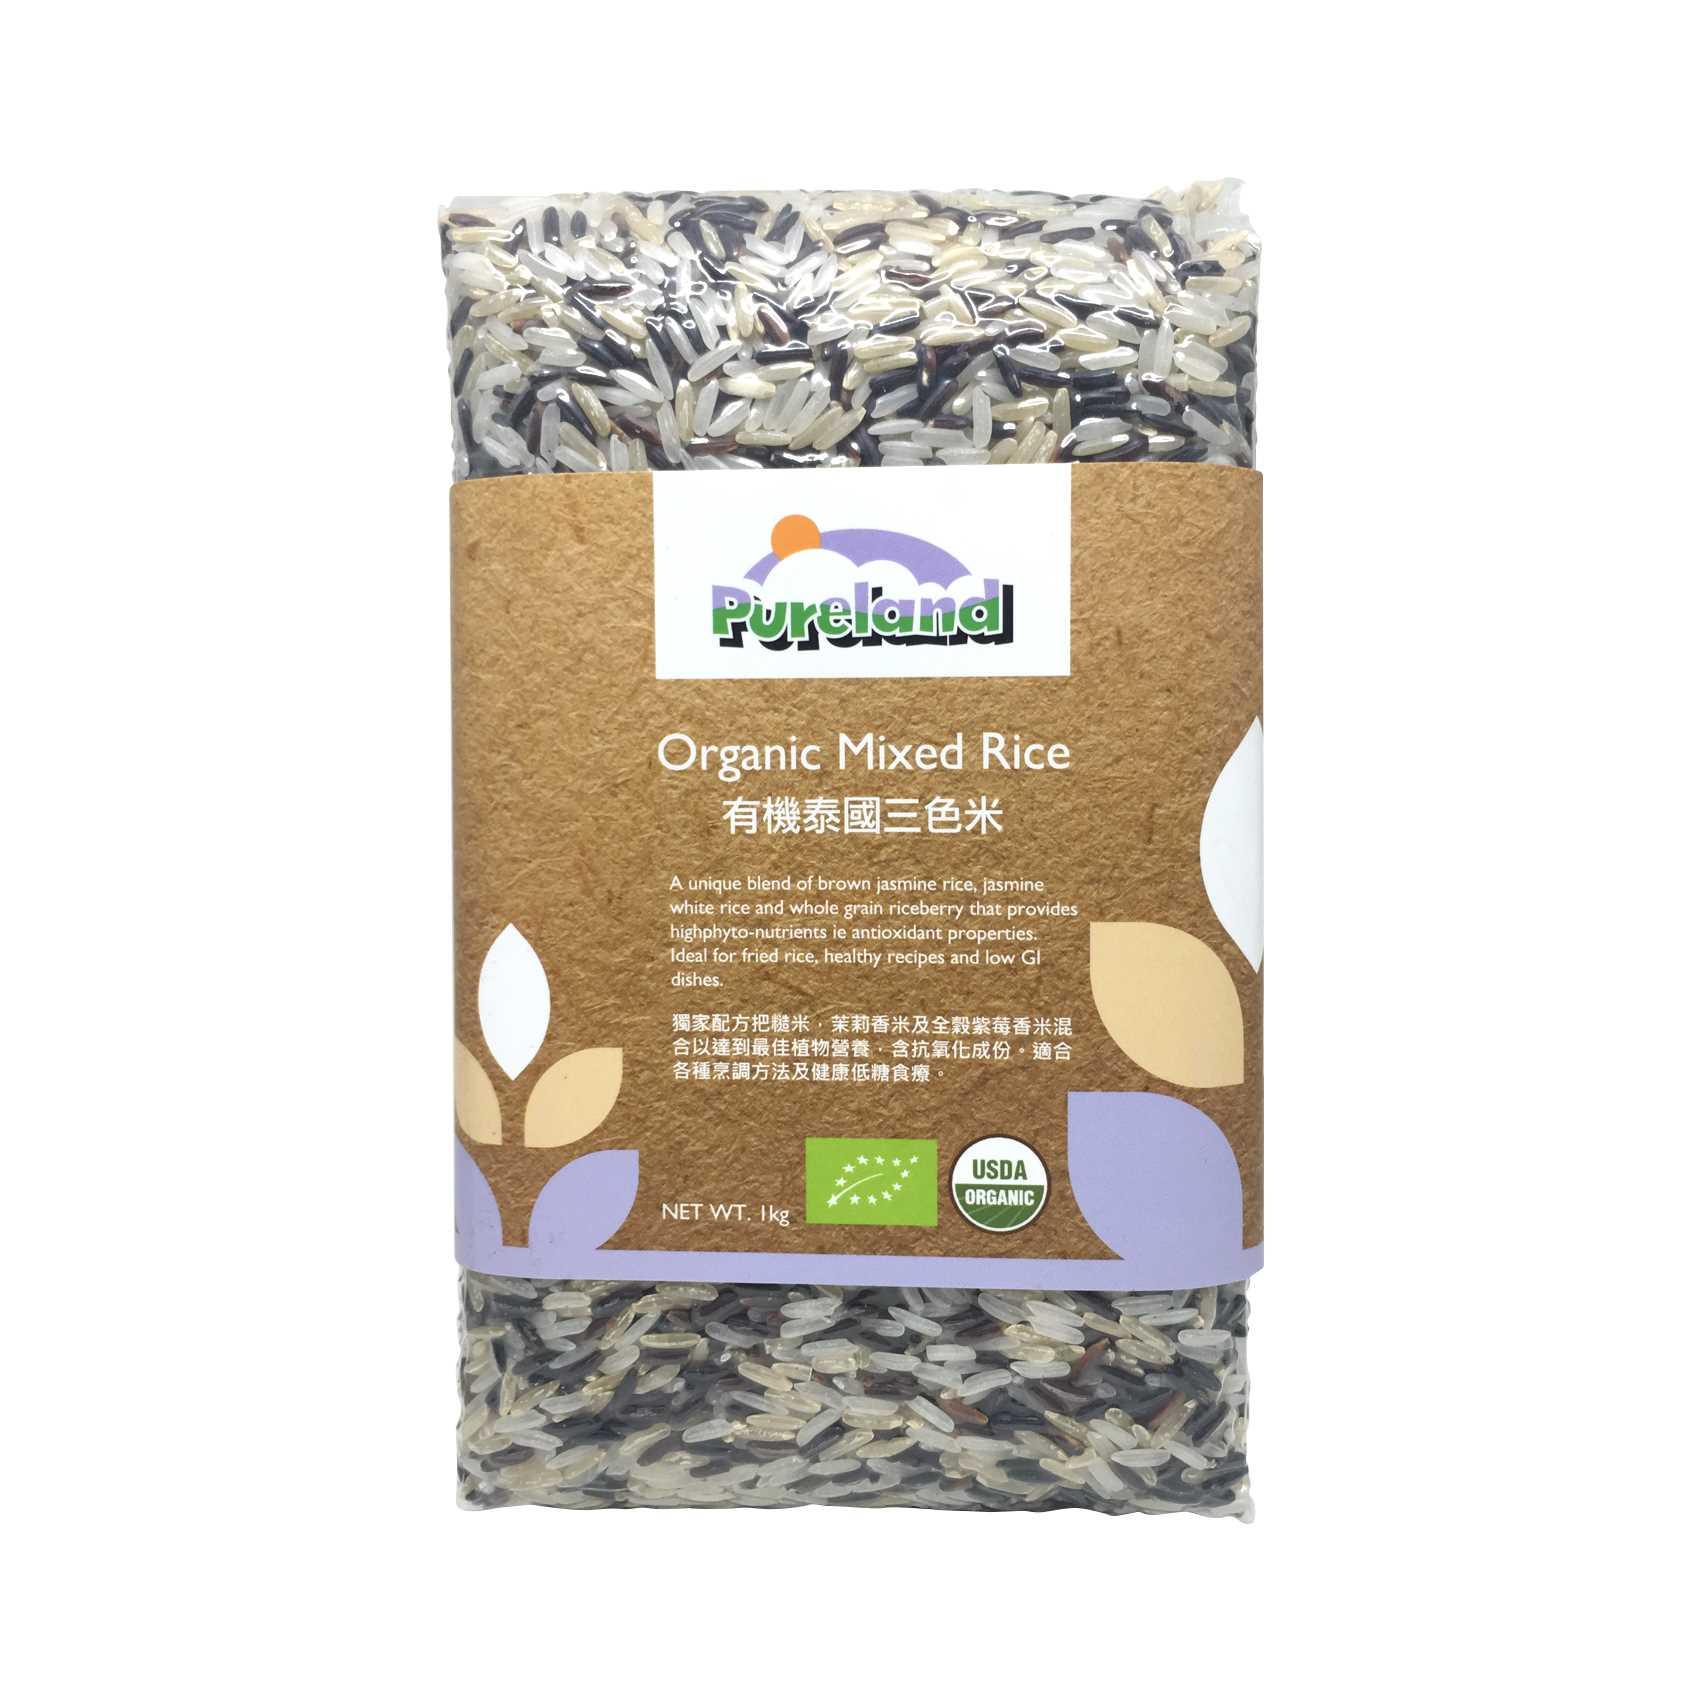 Pureland Organic Mixed Rice 1kg